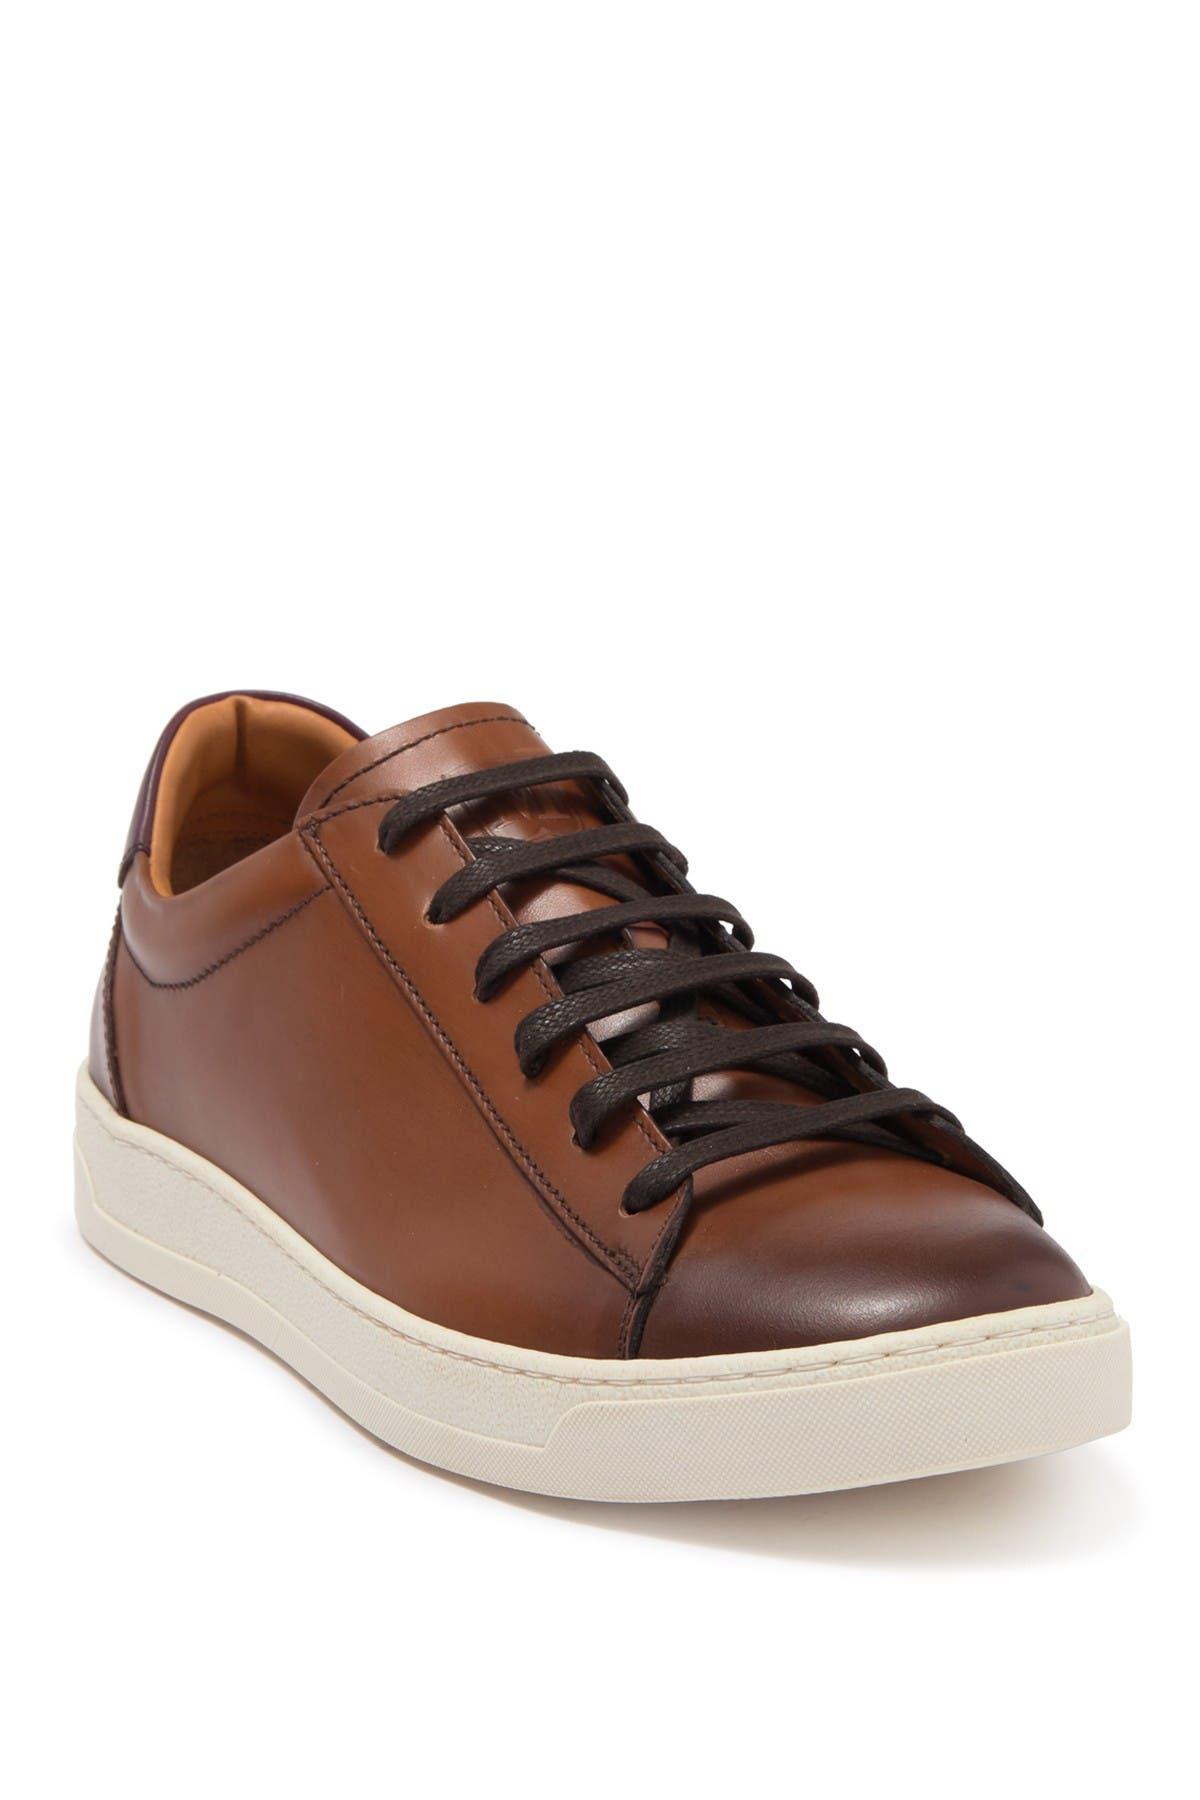 Image of Bruno Magli Diaz Leather Sneaker